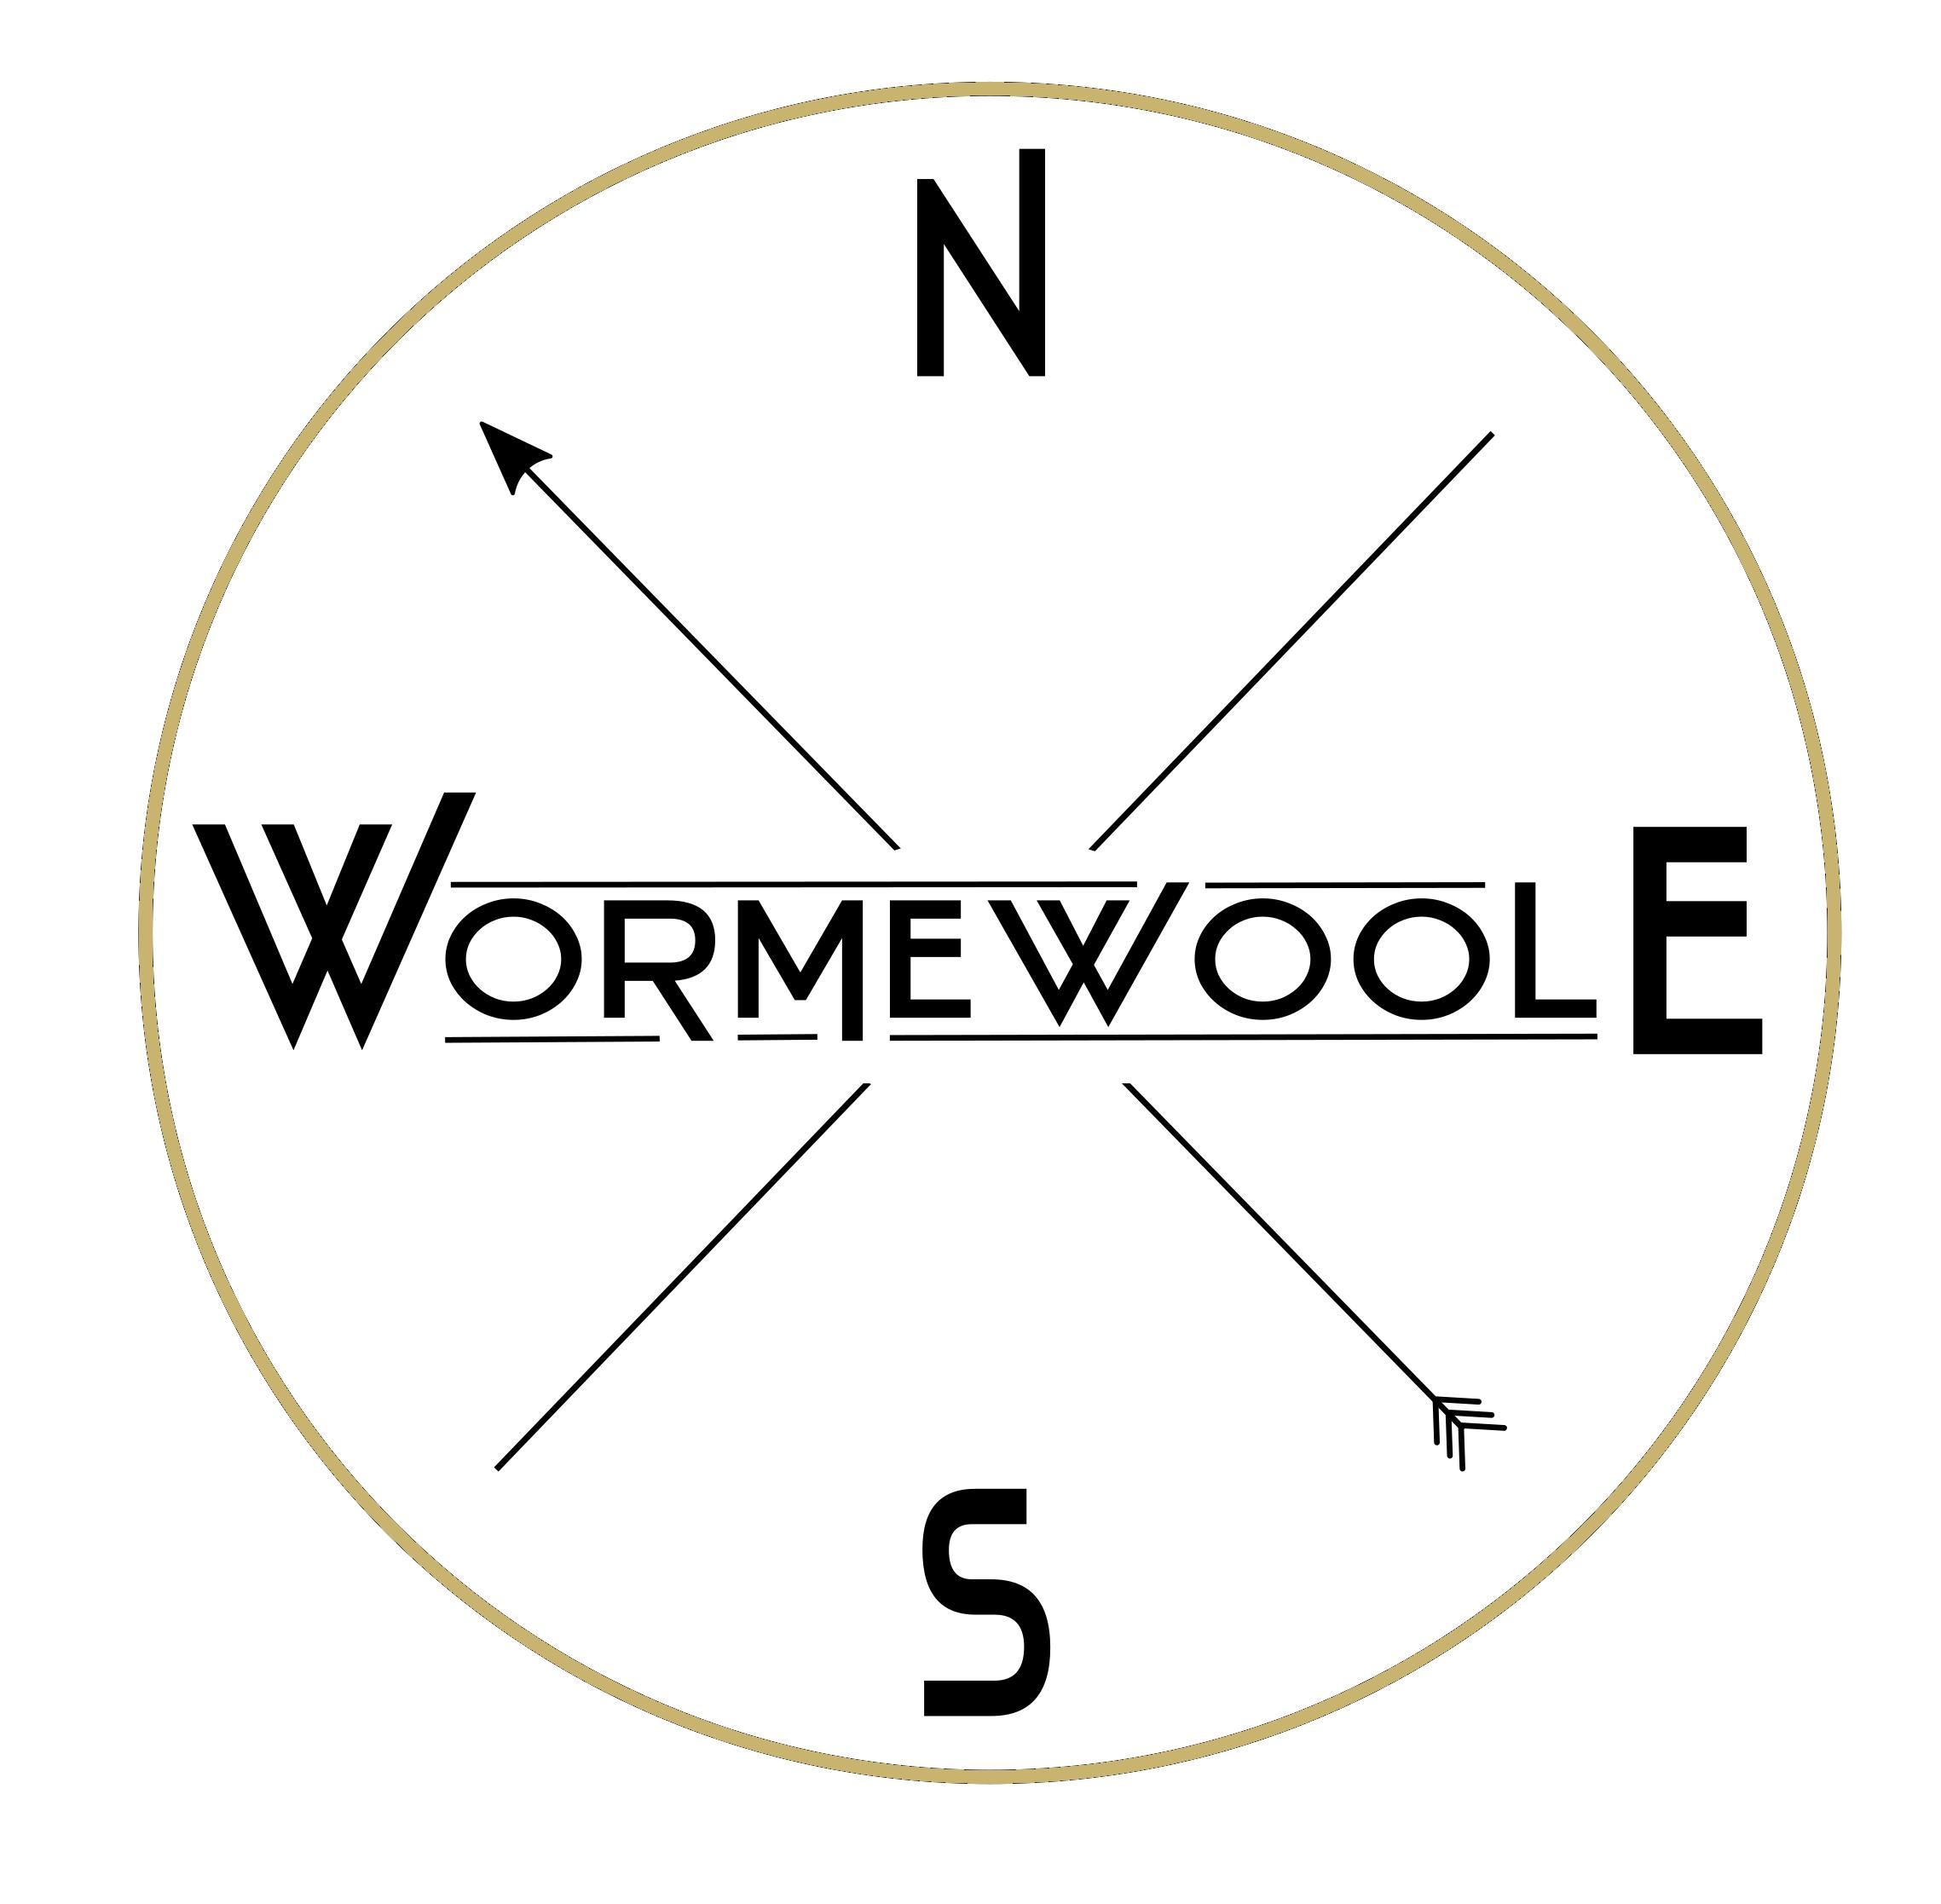 WormeWoole